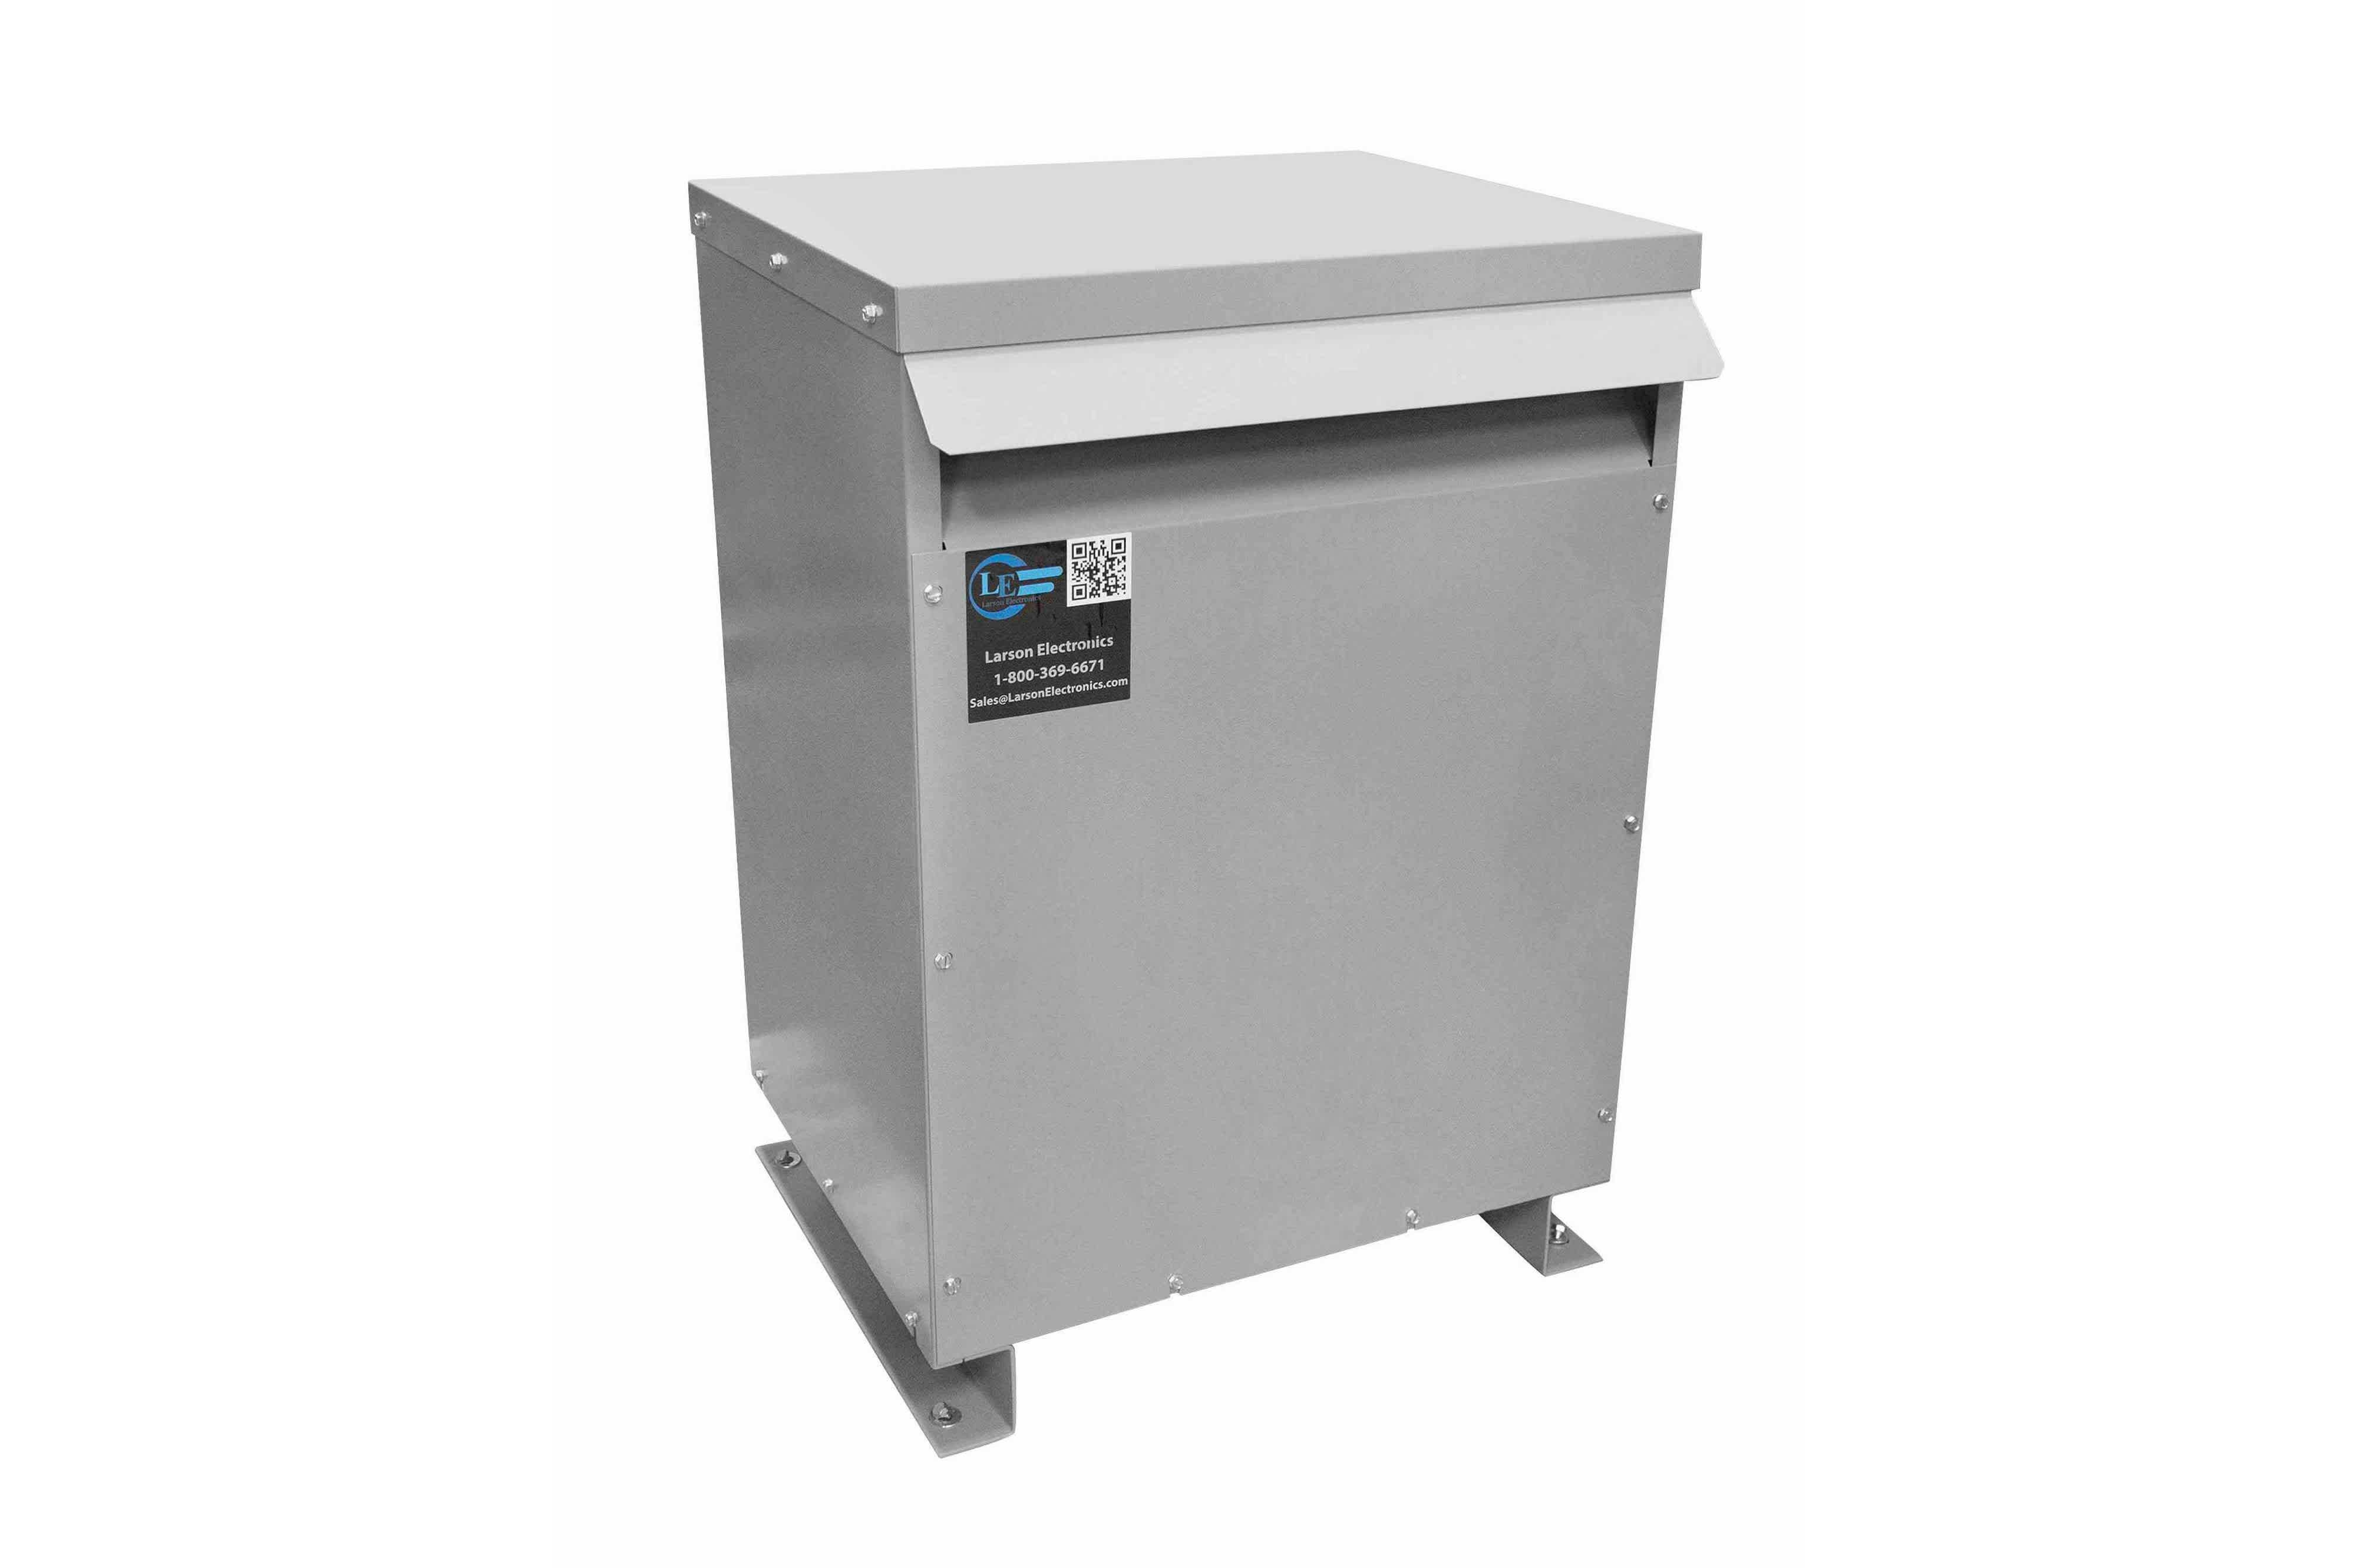 100 kVA 3PH Isolation Transformer, 600V Wye Primary, 400Y/231 Wye-N Secondary, N3R, Ventilated, 60 Hz